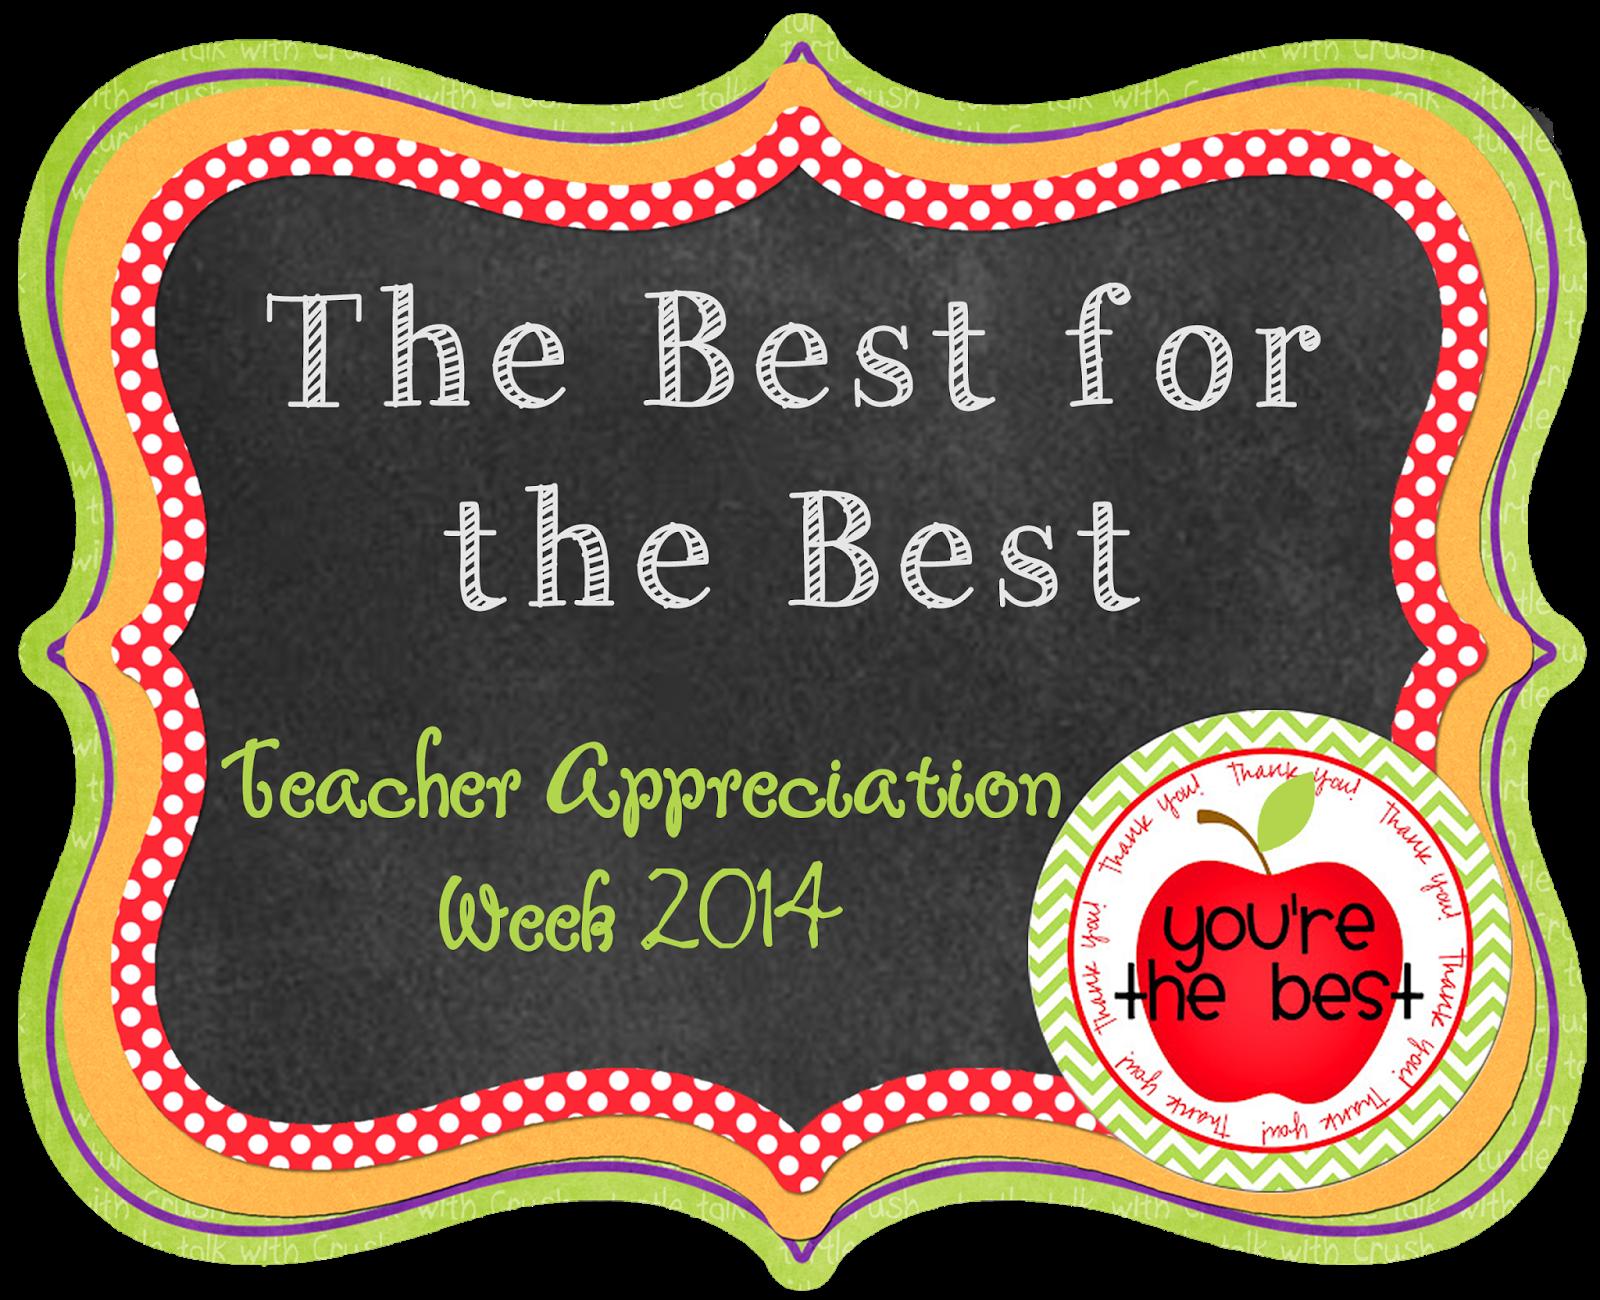 Thanks clipart teacher appreciation week. Techie turtle the best